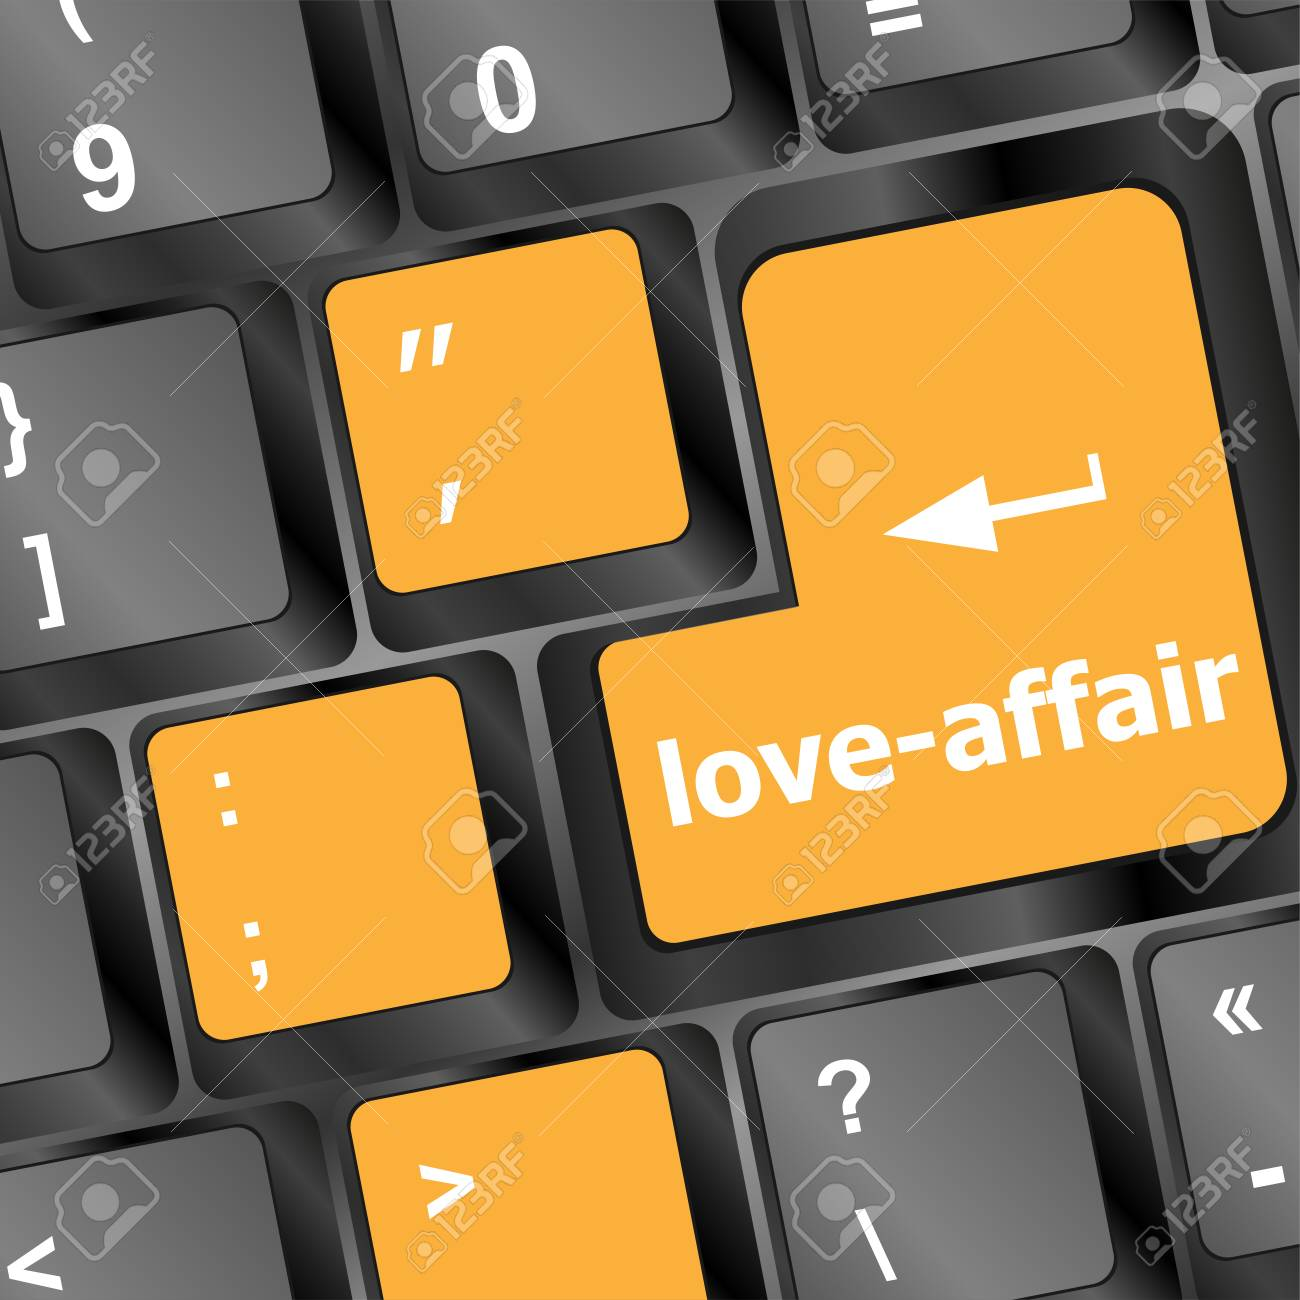 App Gelegenheits-Dating kostenlos Login